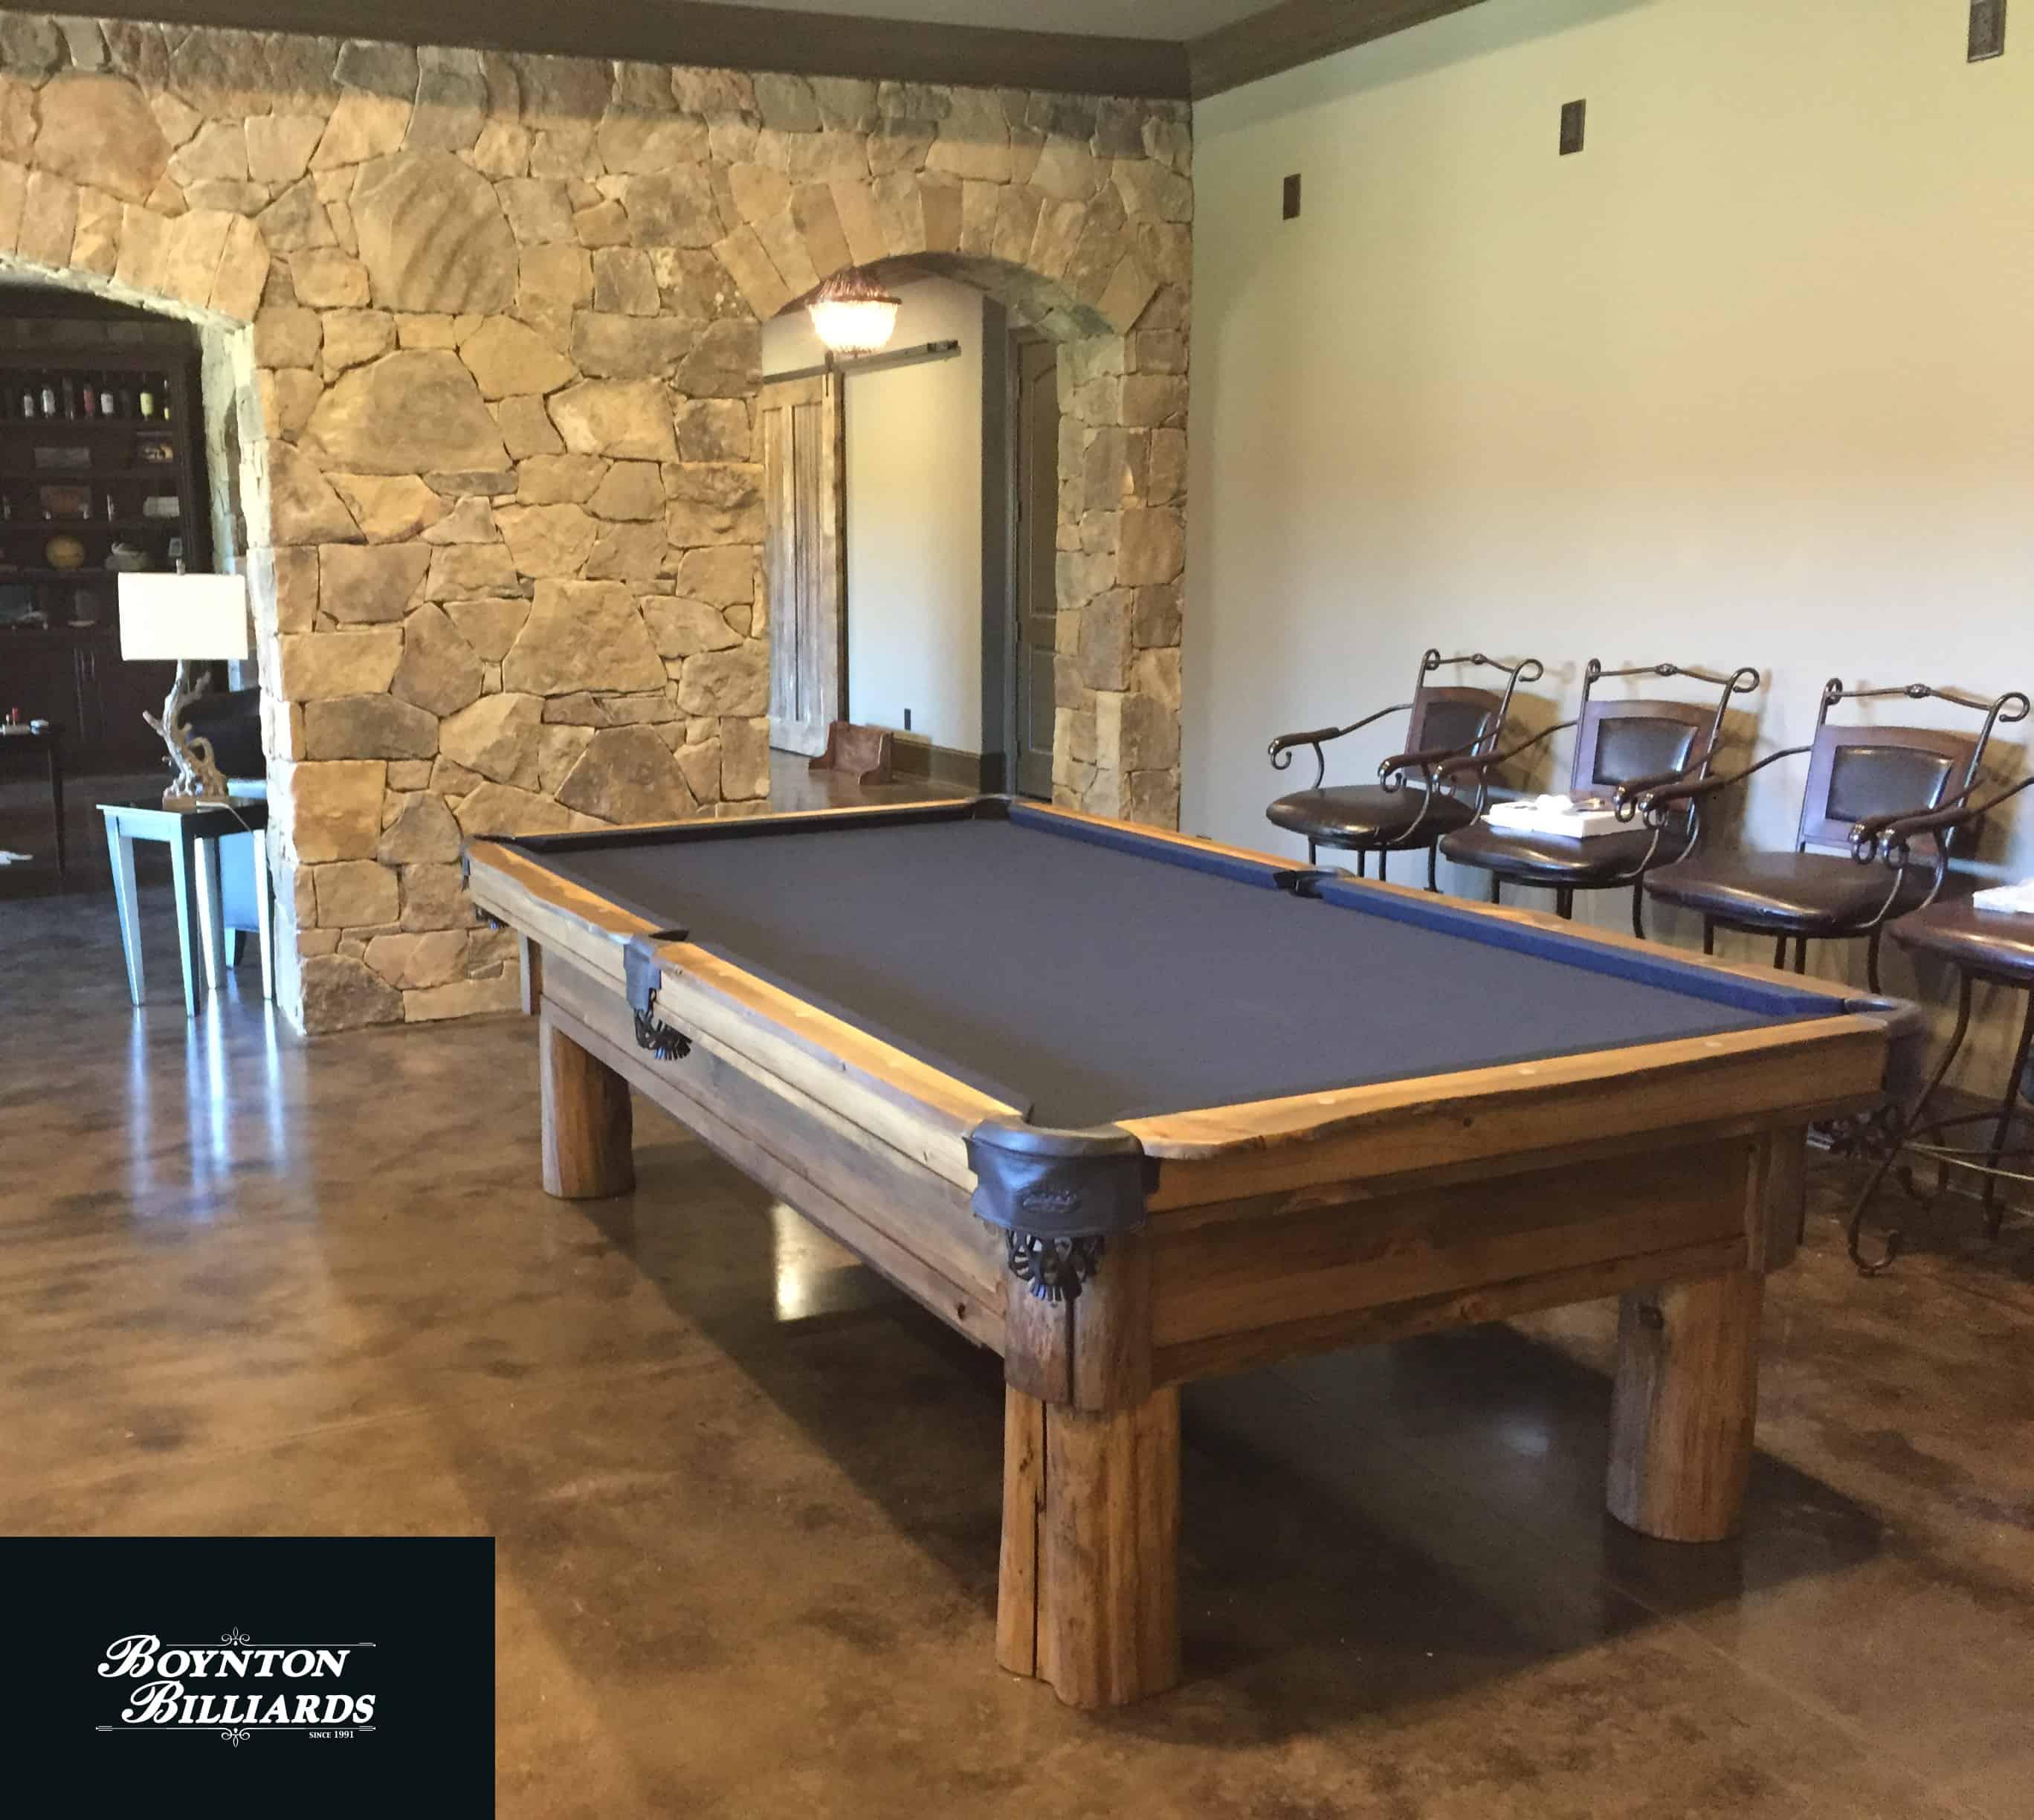 Olhausen Pinehaven Pool Table Boynton Billiards